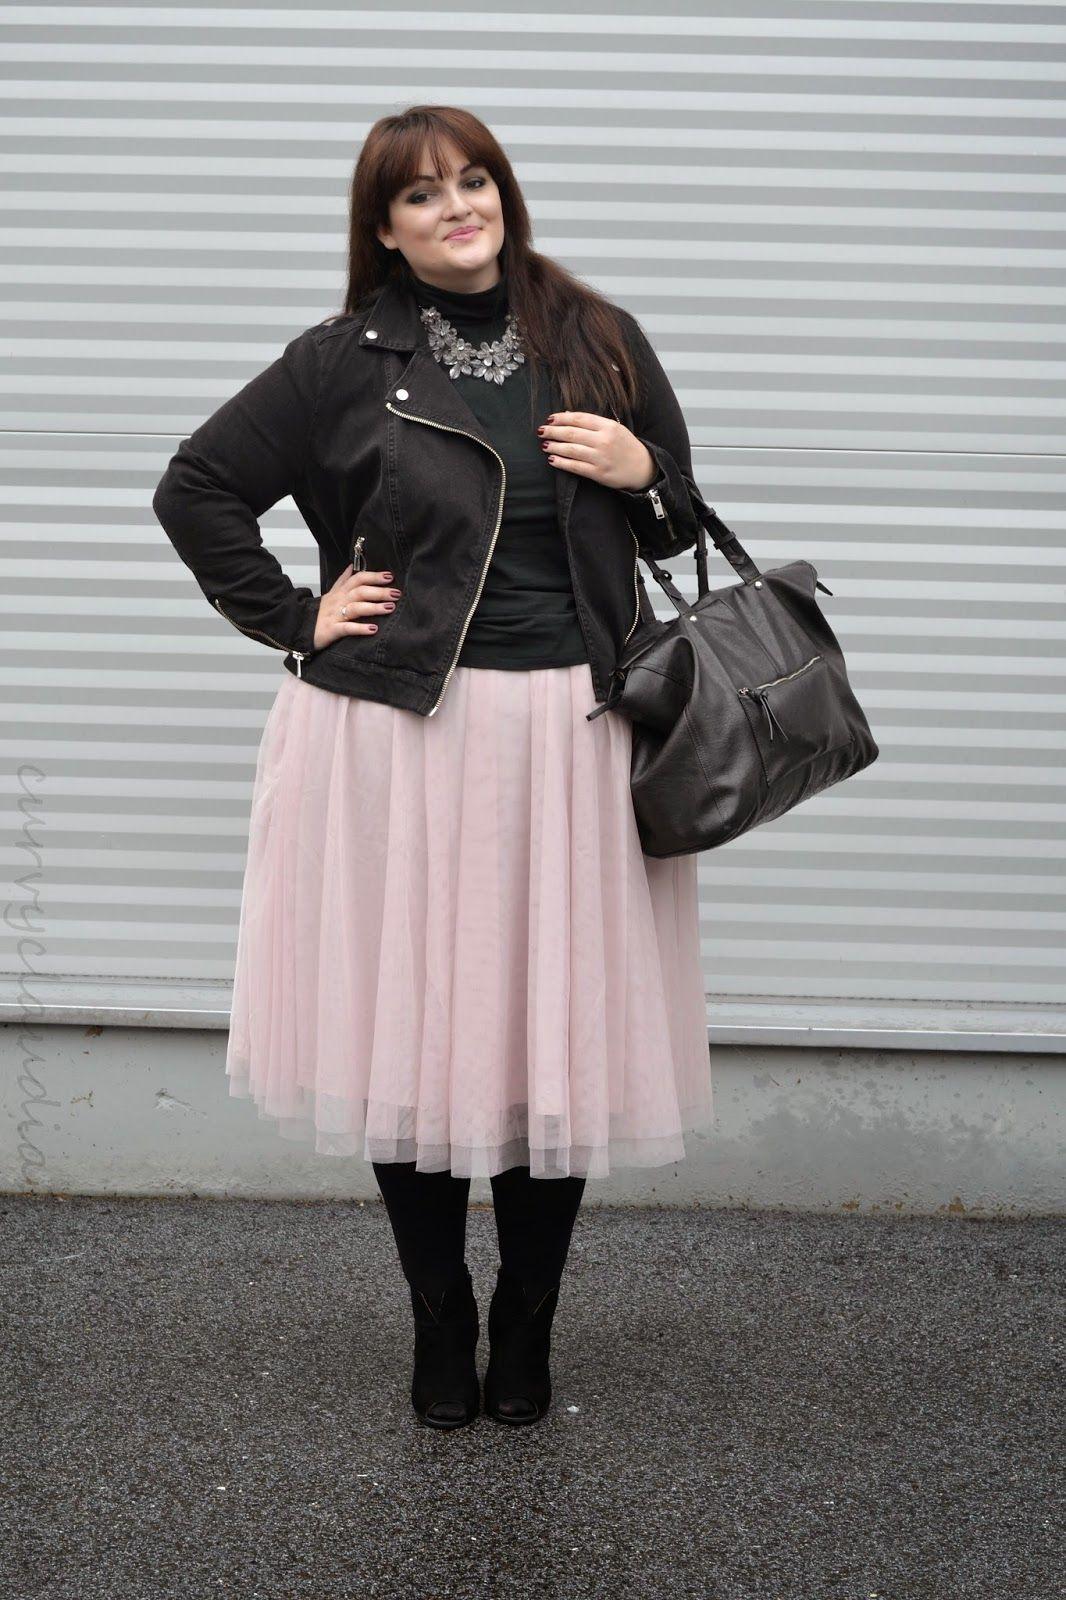 Plus Size Fashion - Curvy Claudia: One skirt, three ways ...